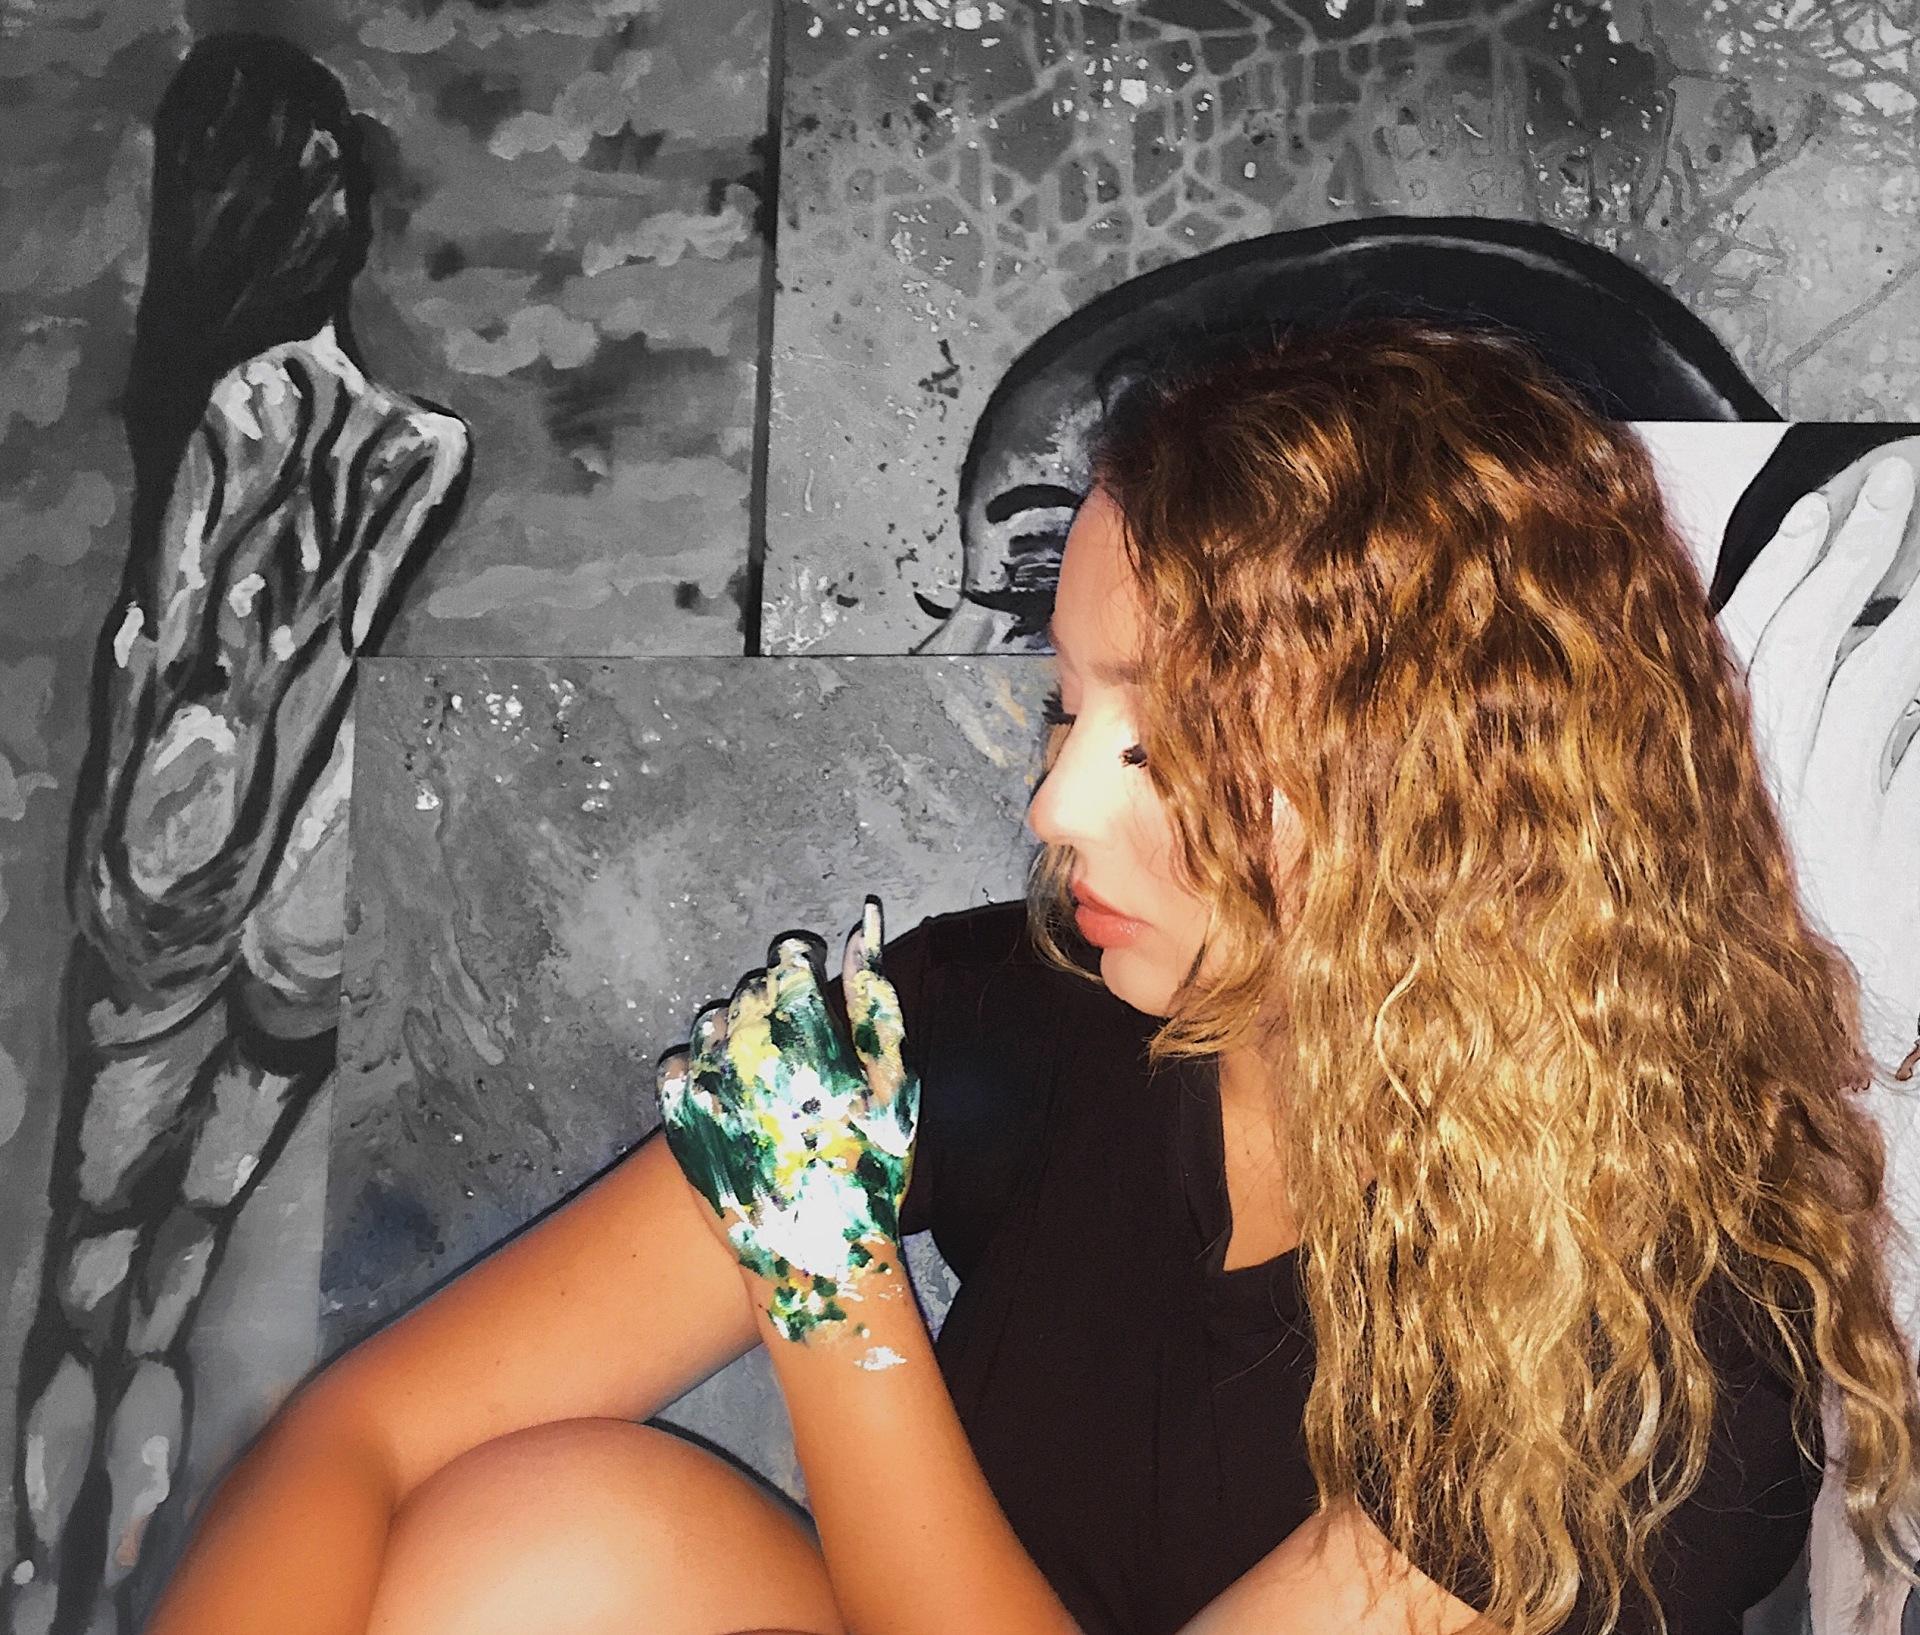 powder room, office, home, living room, family room, basement design, kitchen, white design, interior design, interior designer, bathroom, washroom, decor, artist, toronto,mississauga, oakville, etobicoke, brampton, 3d renderings, acrylic paintings, acrylic artist, bedroom design, room design, home design, contemporary, modern, urban, custom home, custom millwork, consultation, E-design, furniture, colour consultation, Cad drawings, portraits, construction plans,